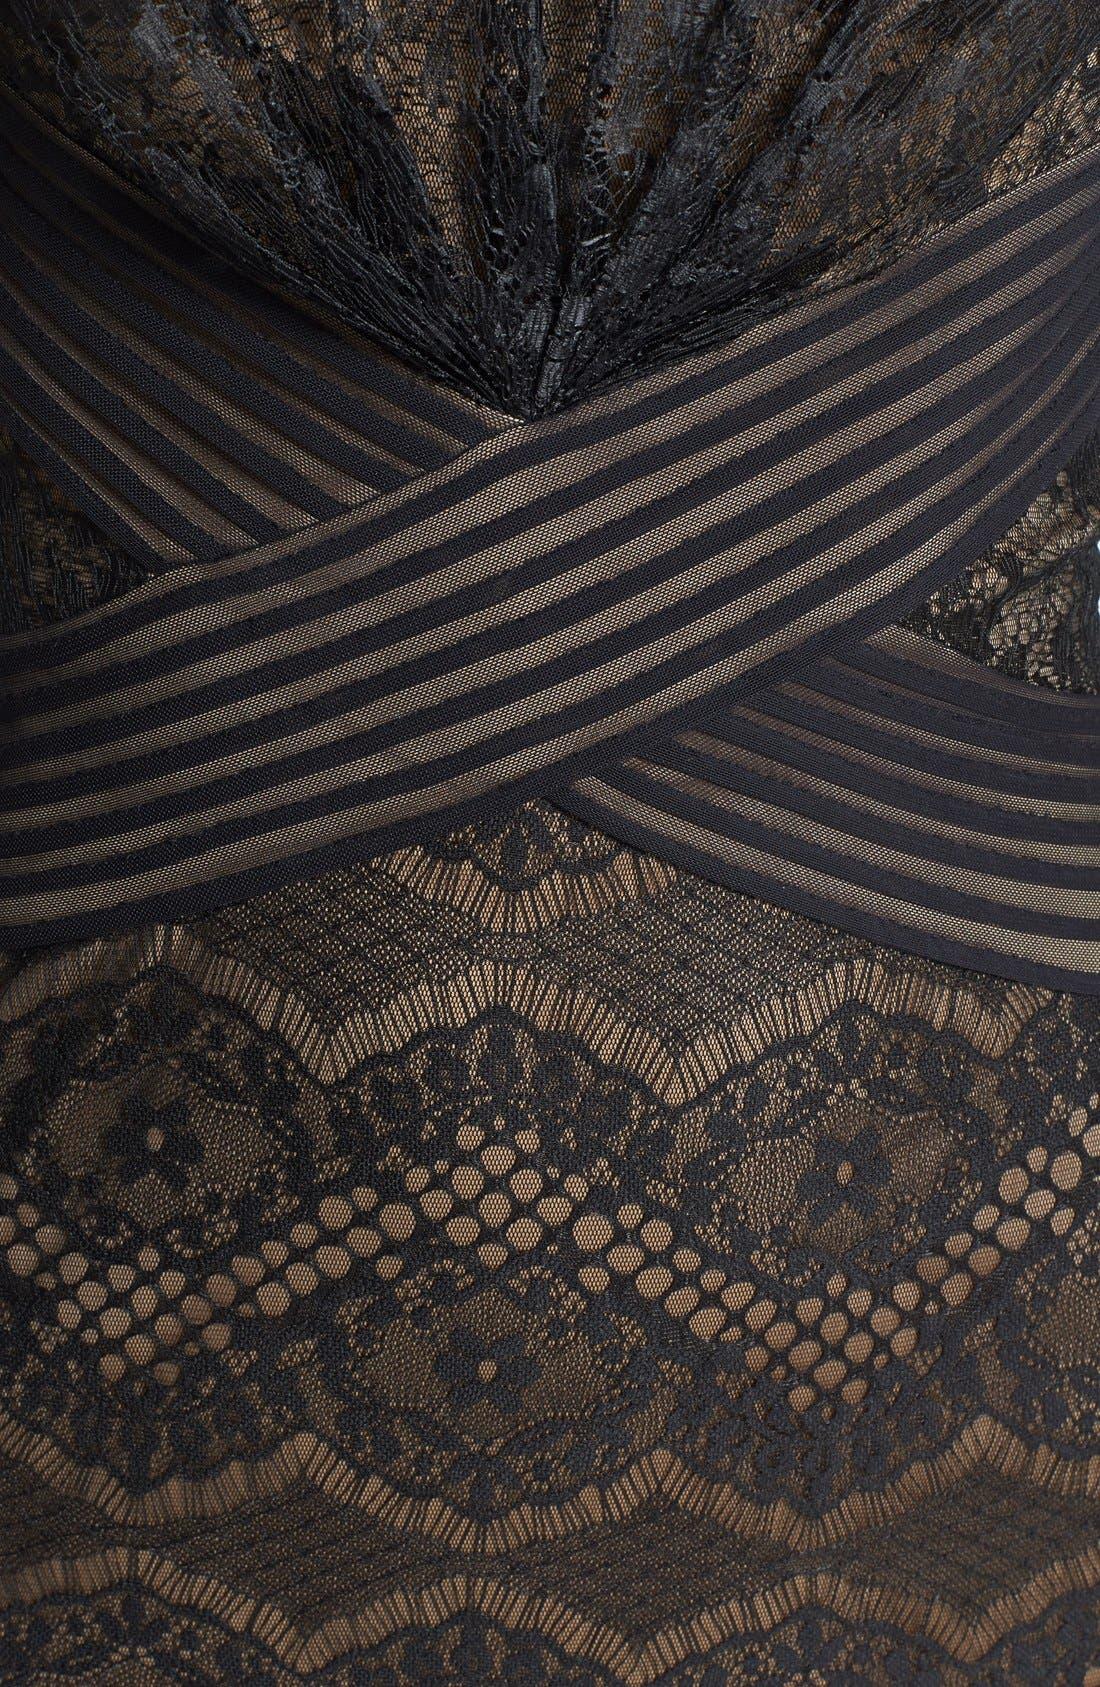 TADASHI SHOJI, Lace Sheath Dress, Alternate thumbnail 2, color, 004